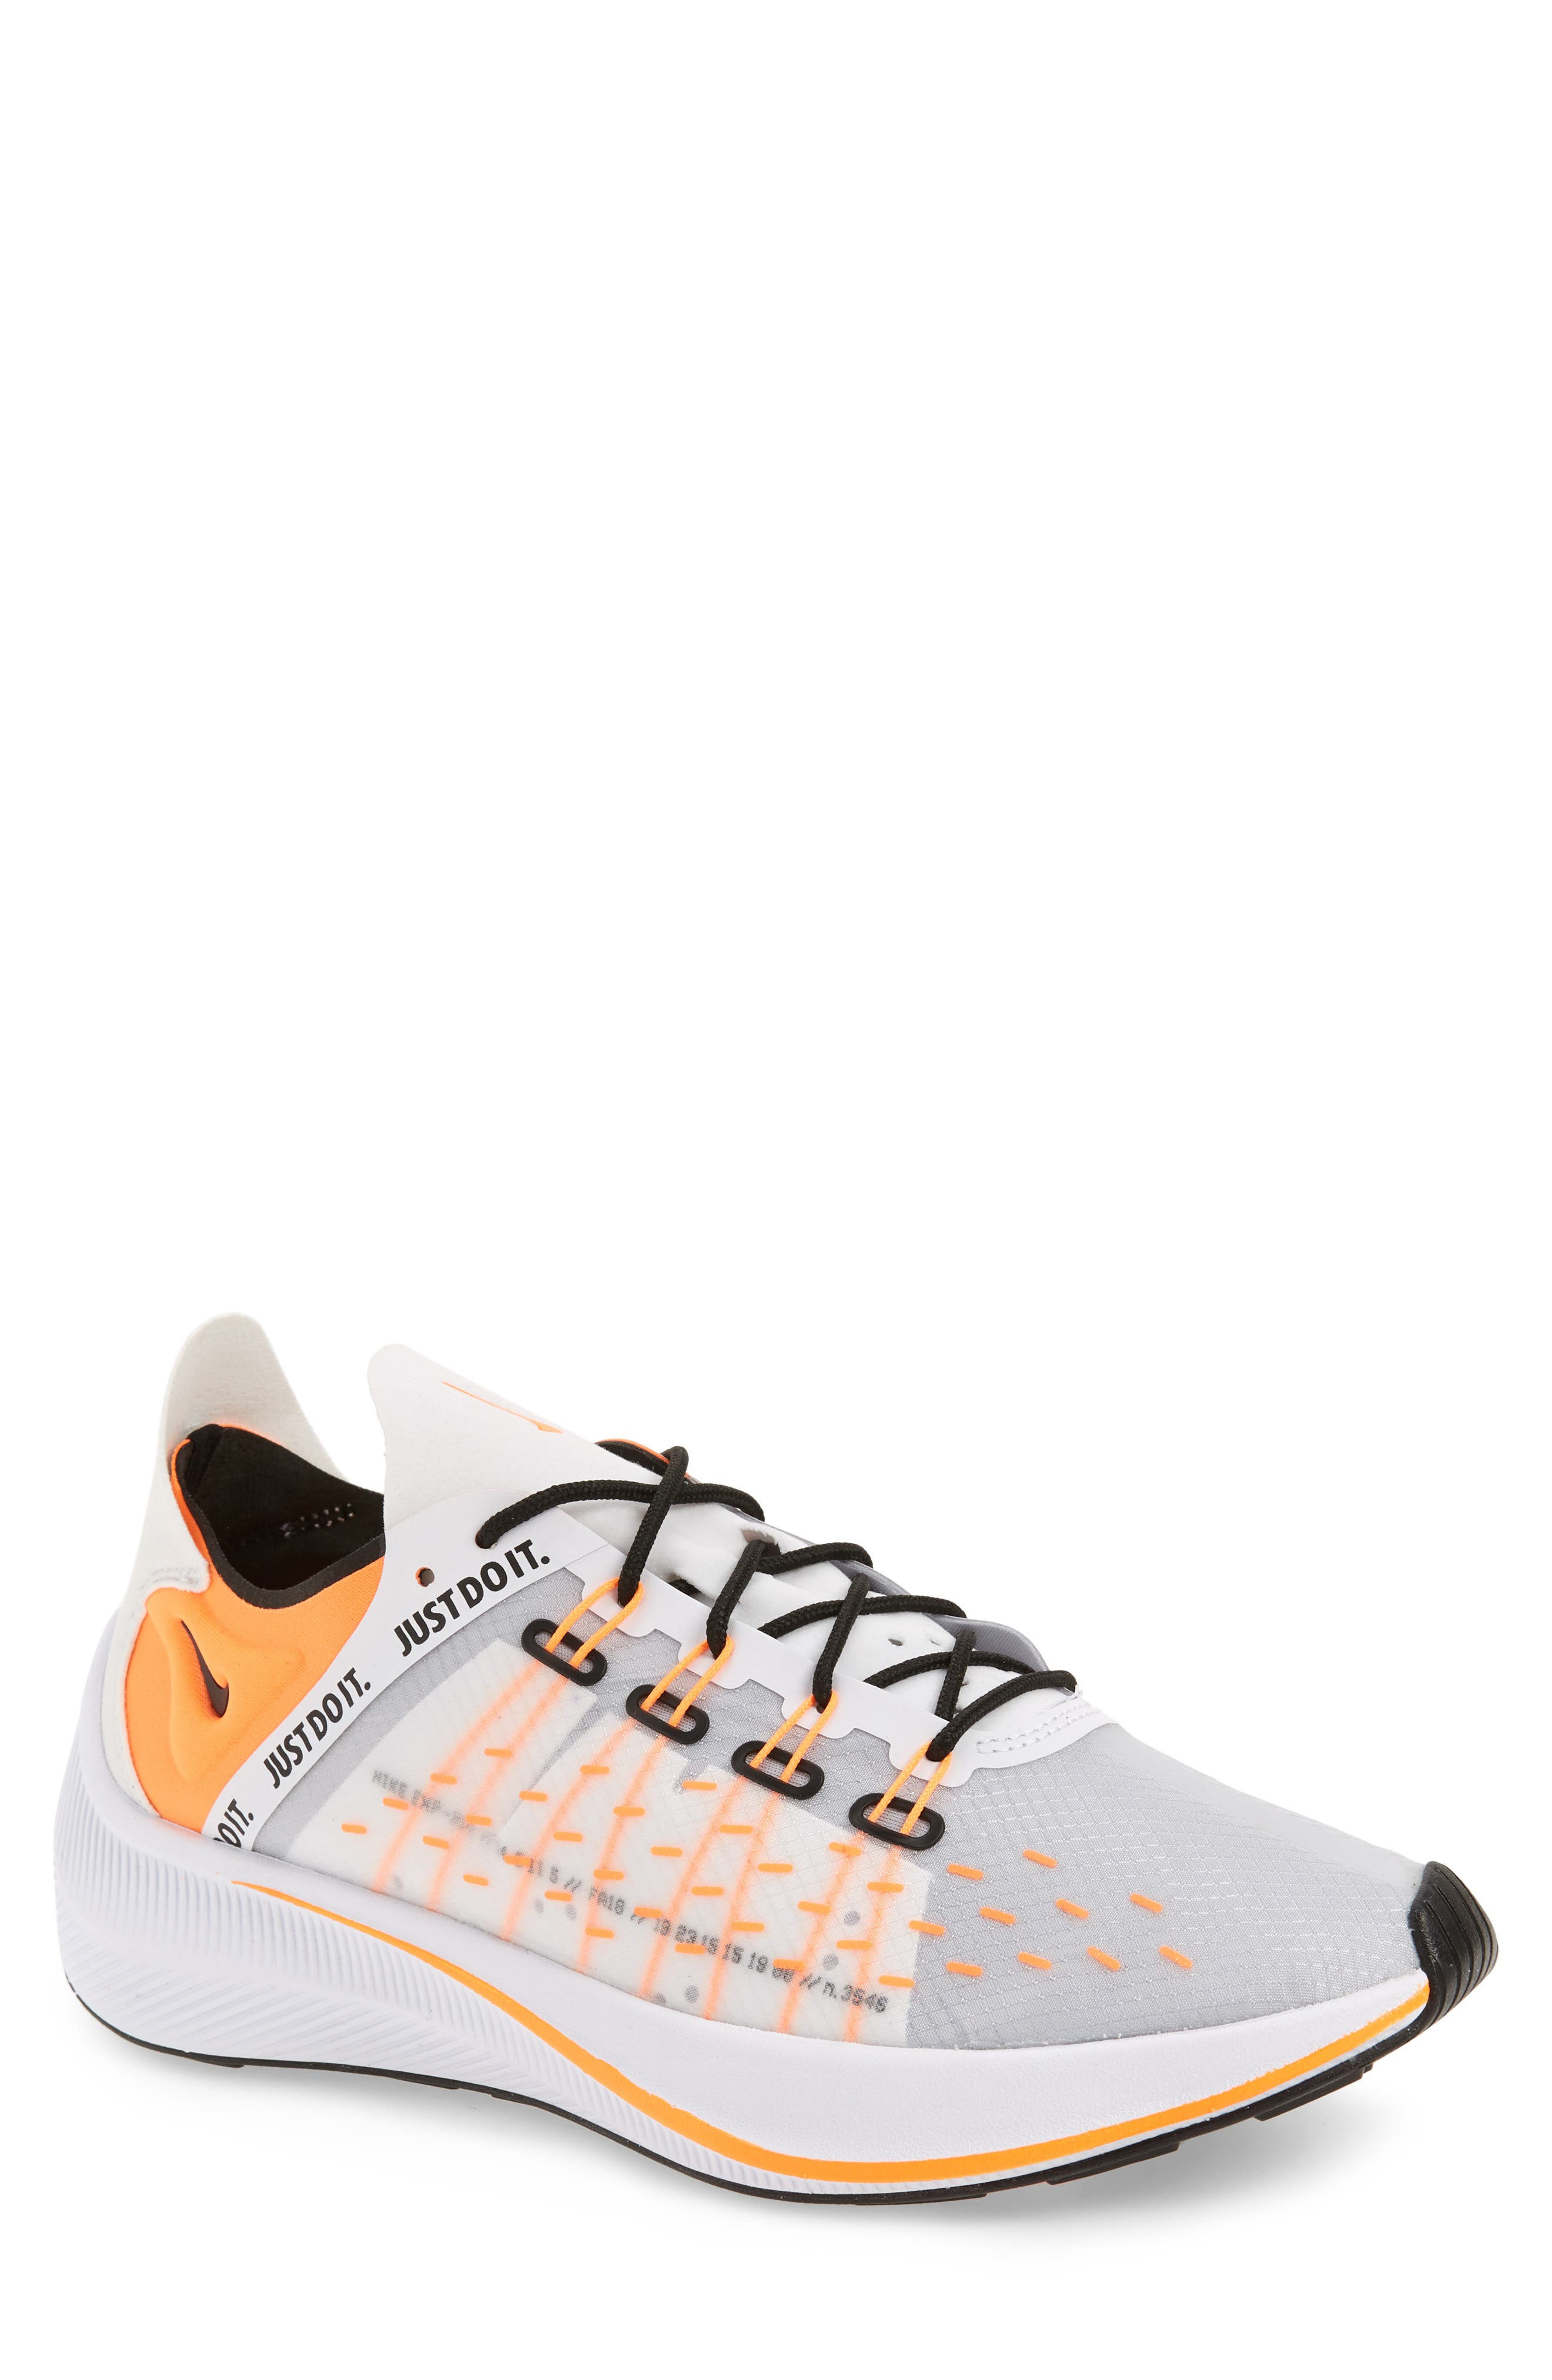 EXP-X14 Just Do It Sneaker,                             Main thumbnail 1, color,                             100